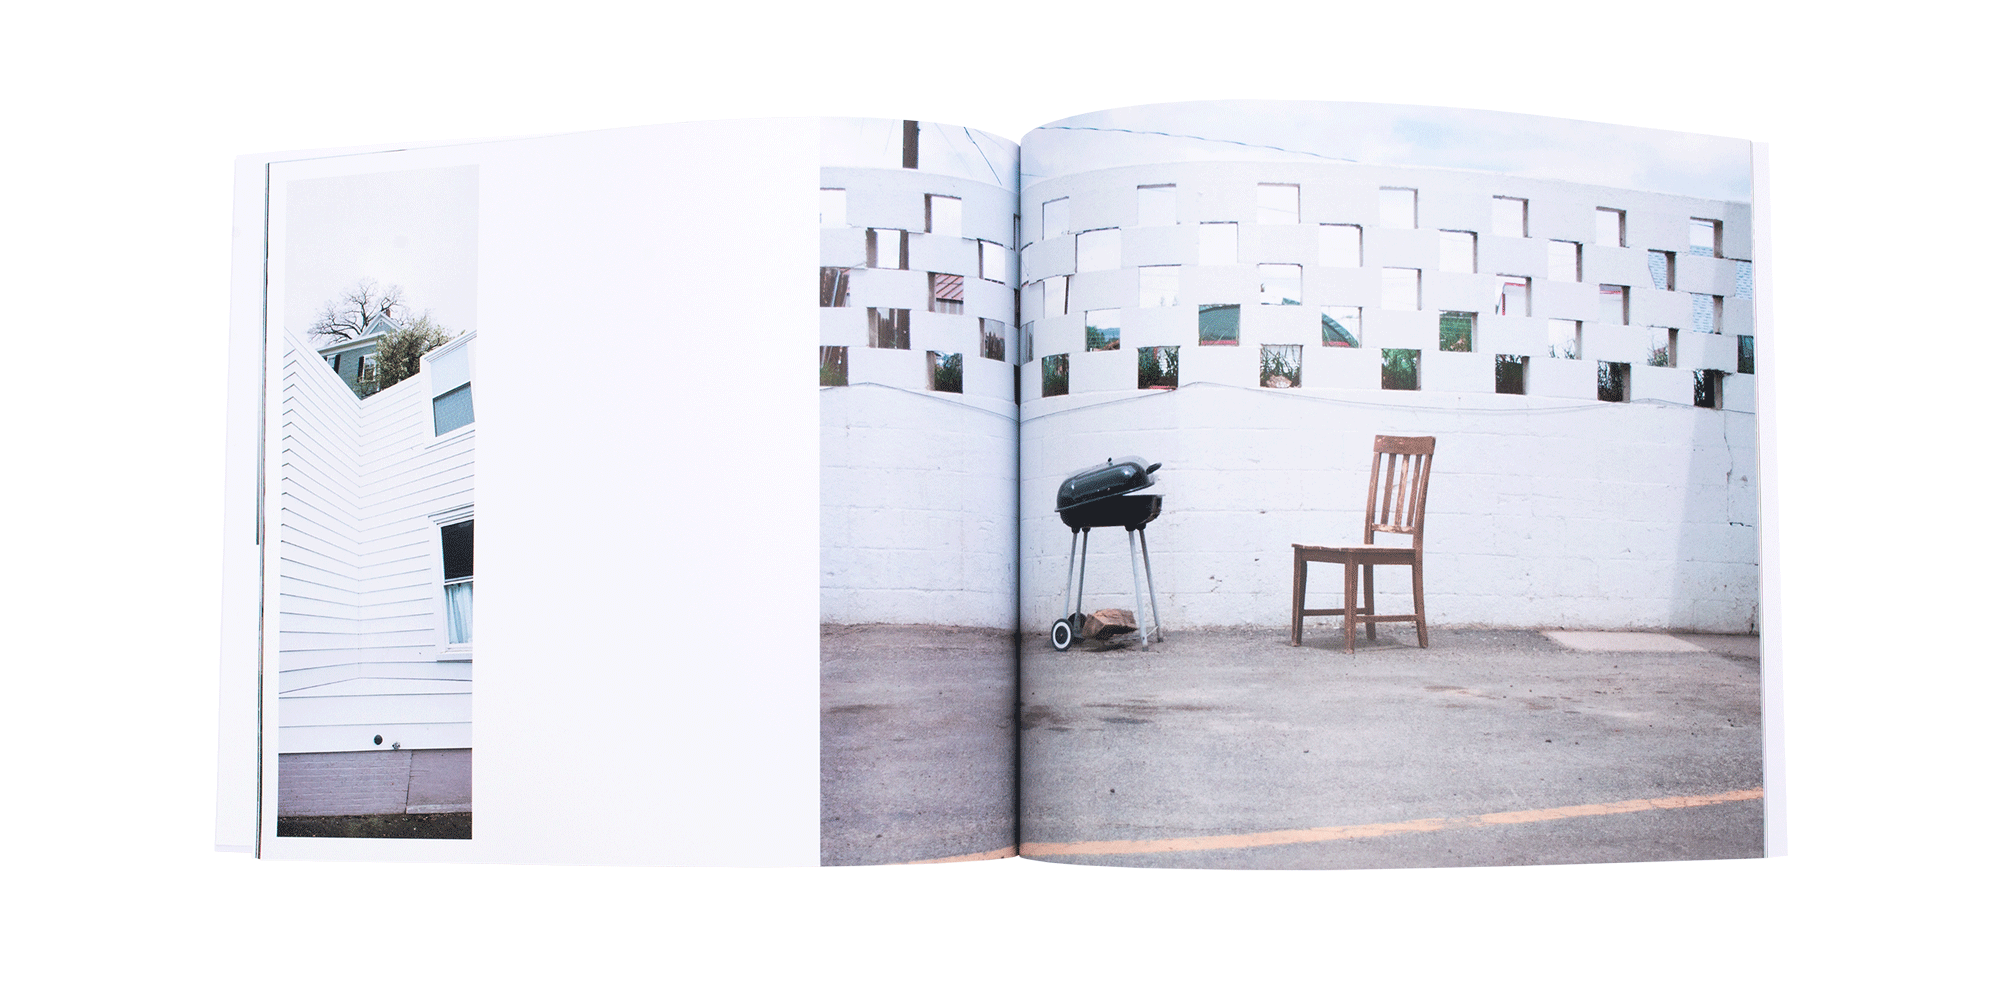 Middle Ground Collaborative Photo Book Spread 1 Design and Photography - Loren Marple